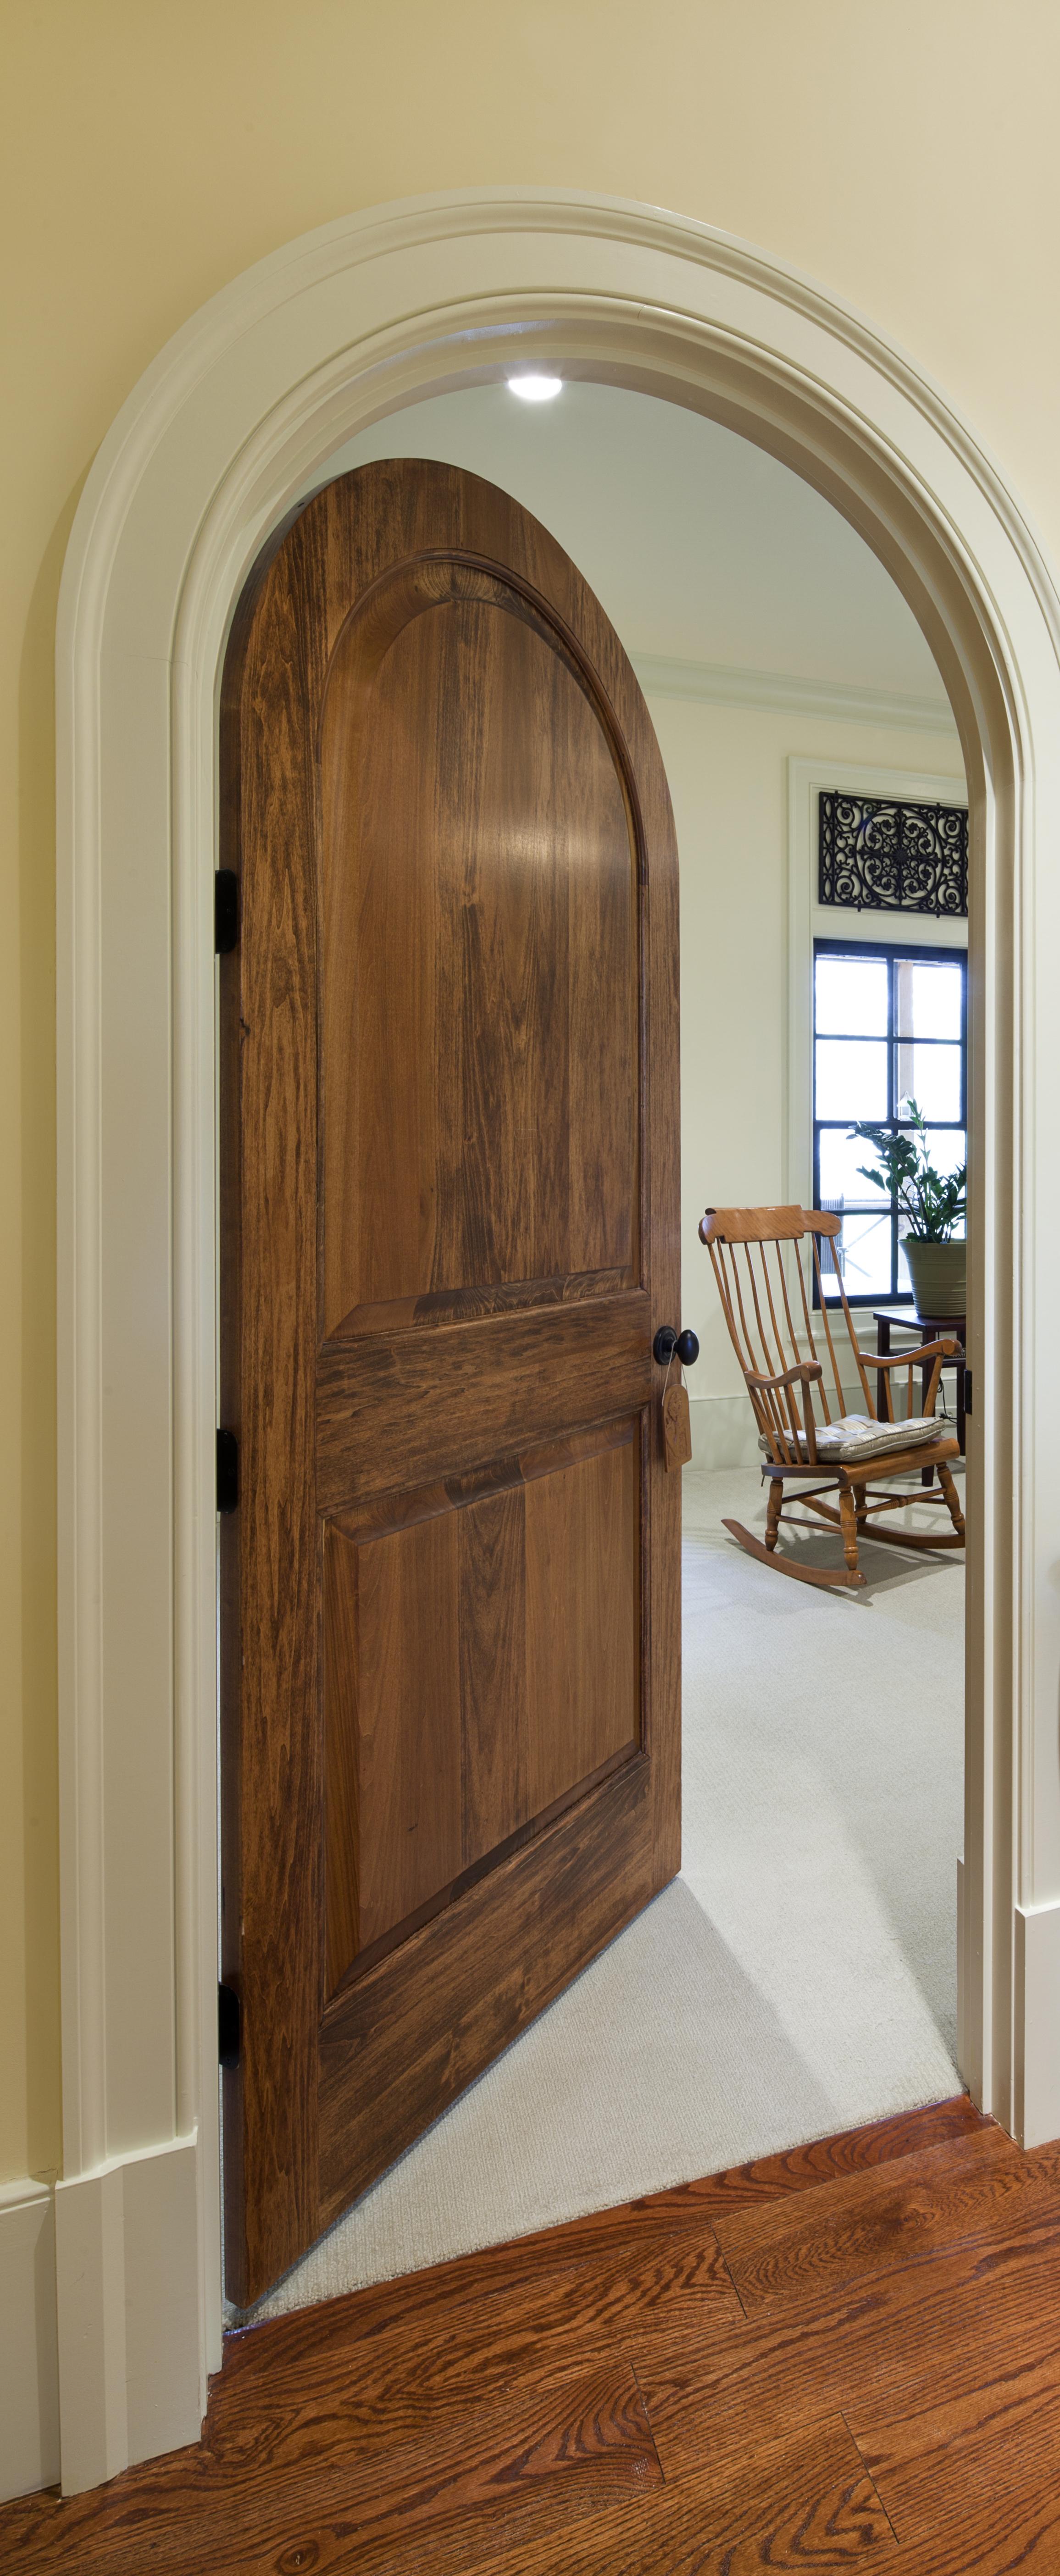 RiversideInt9 arched door cropped.jpg